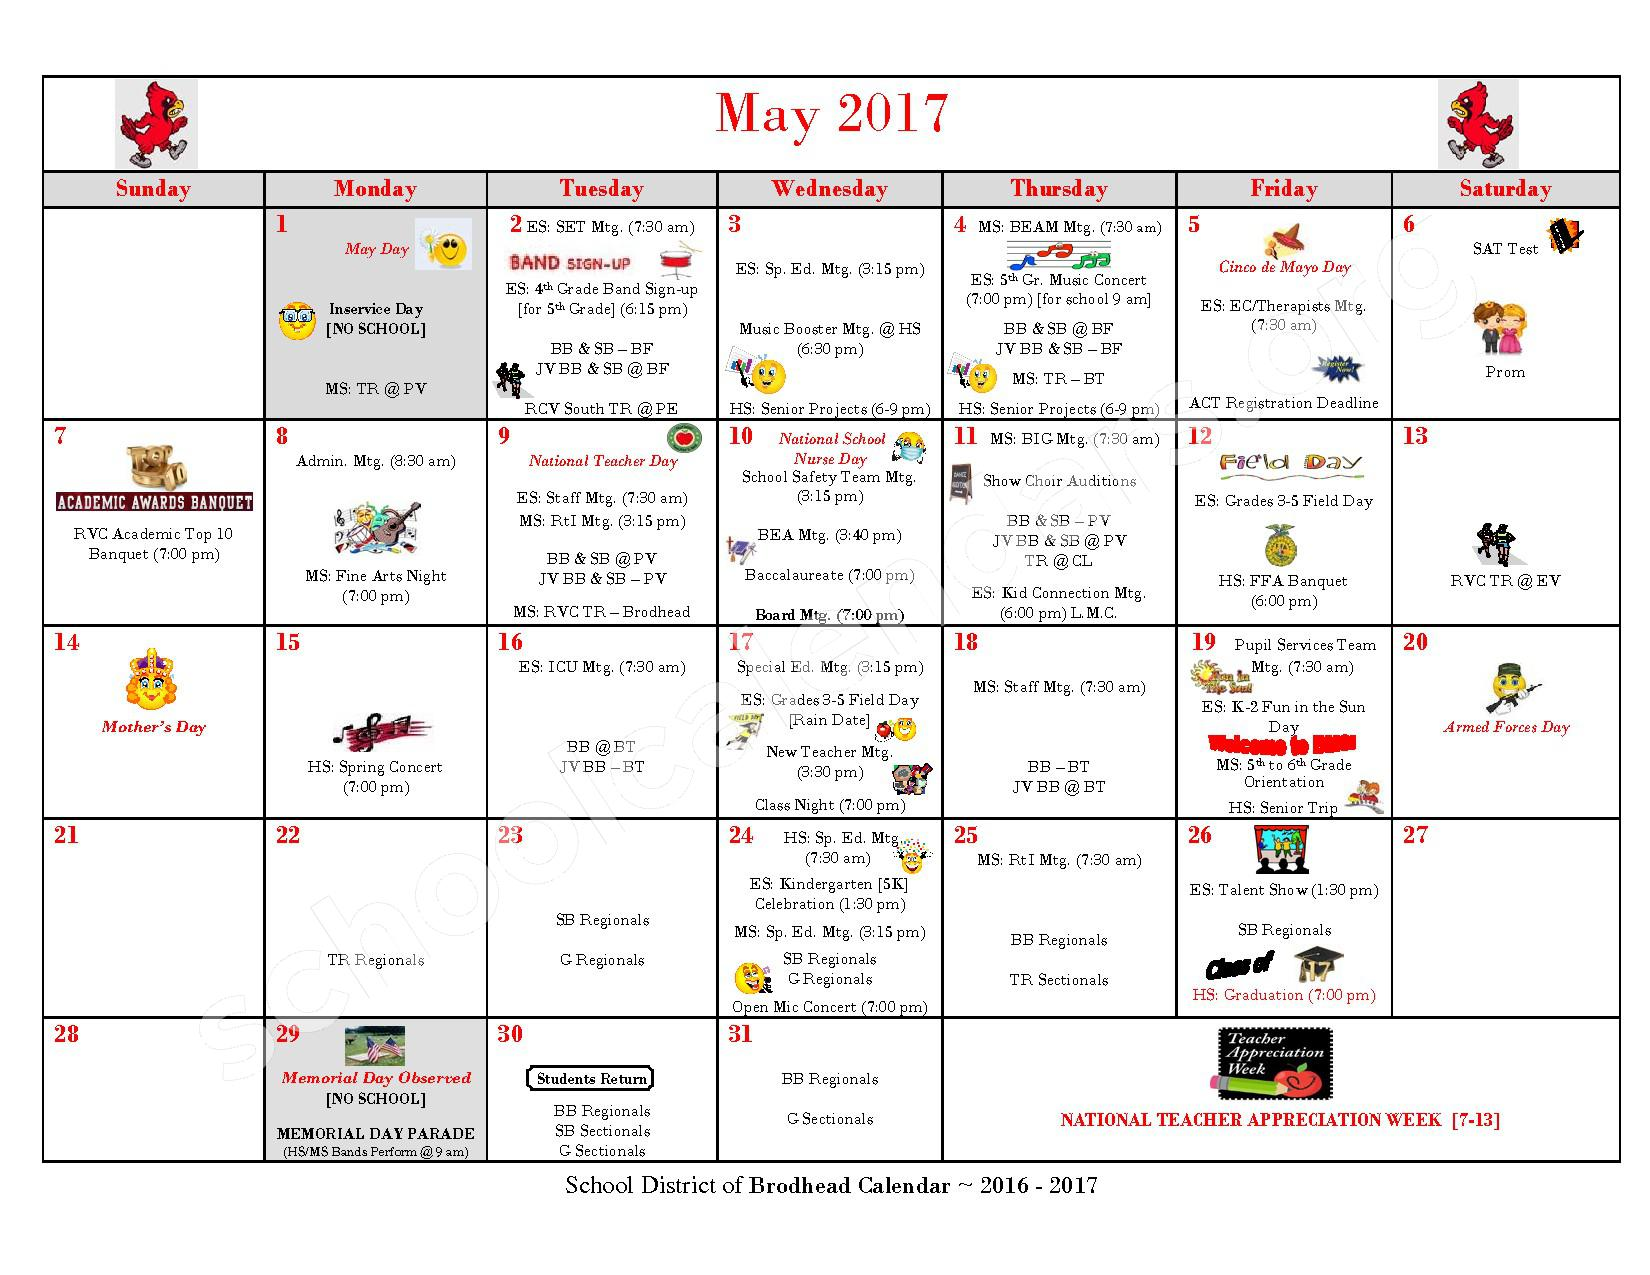 2016 - 2017 School Calendar – Brodhead School District – page 10